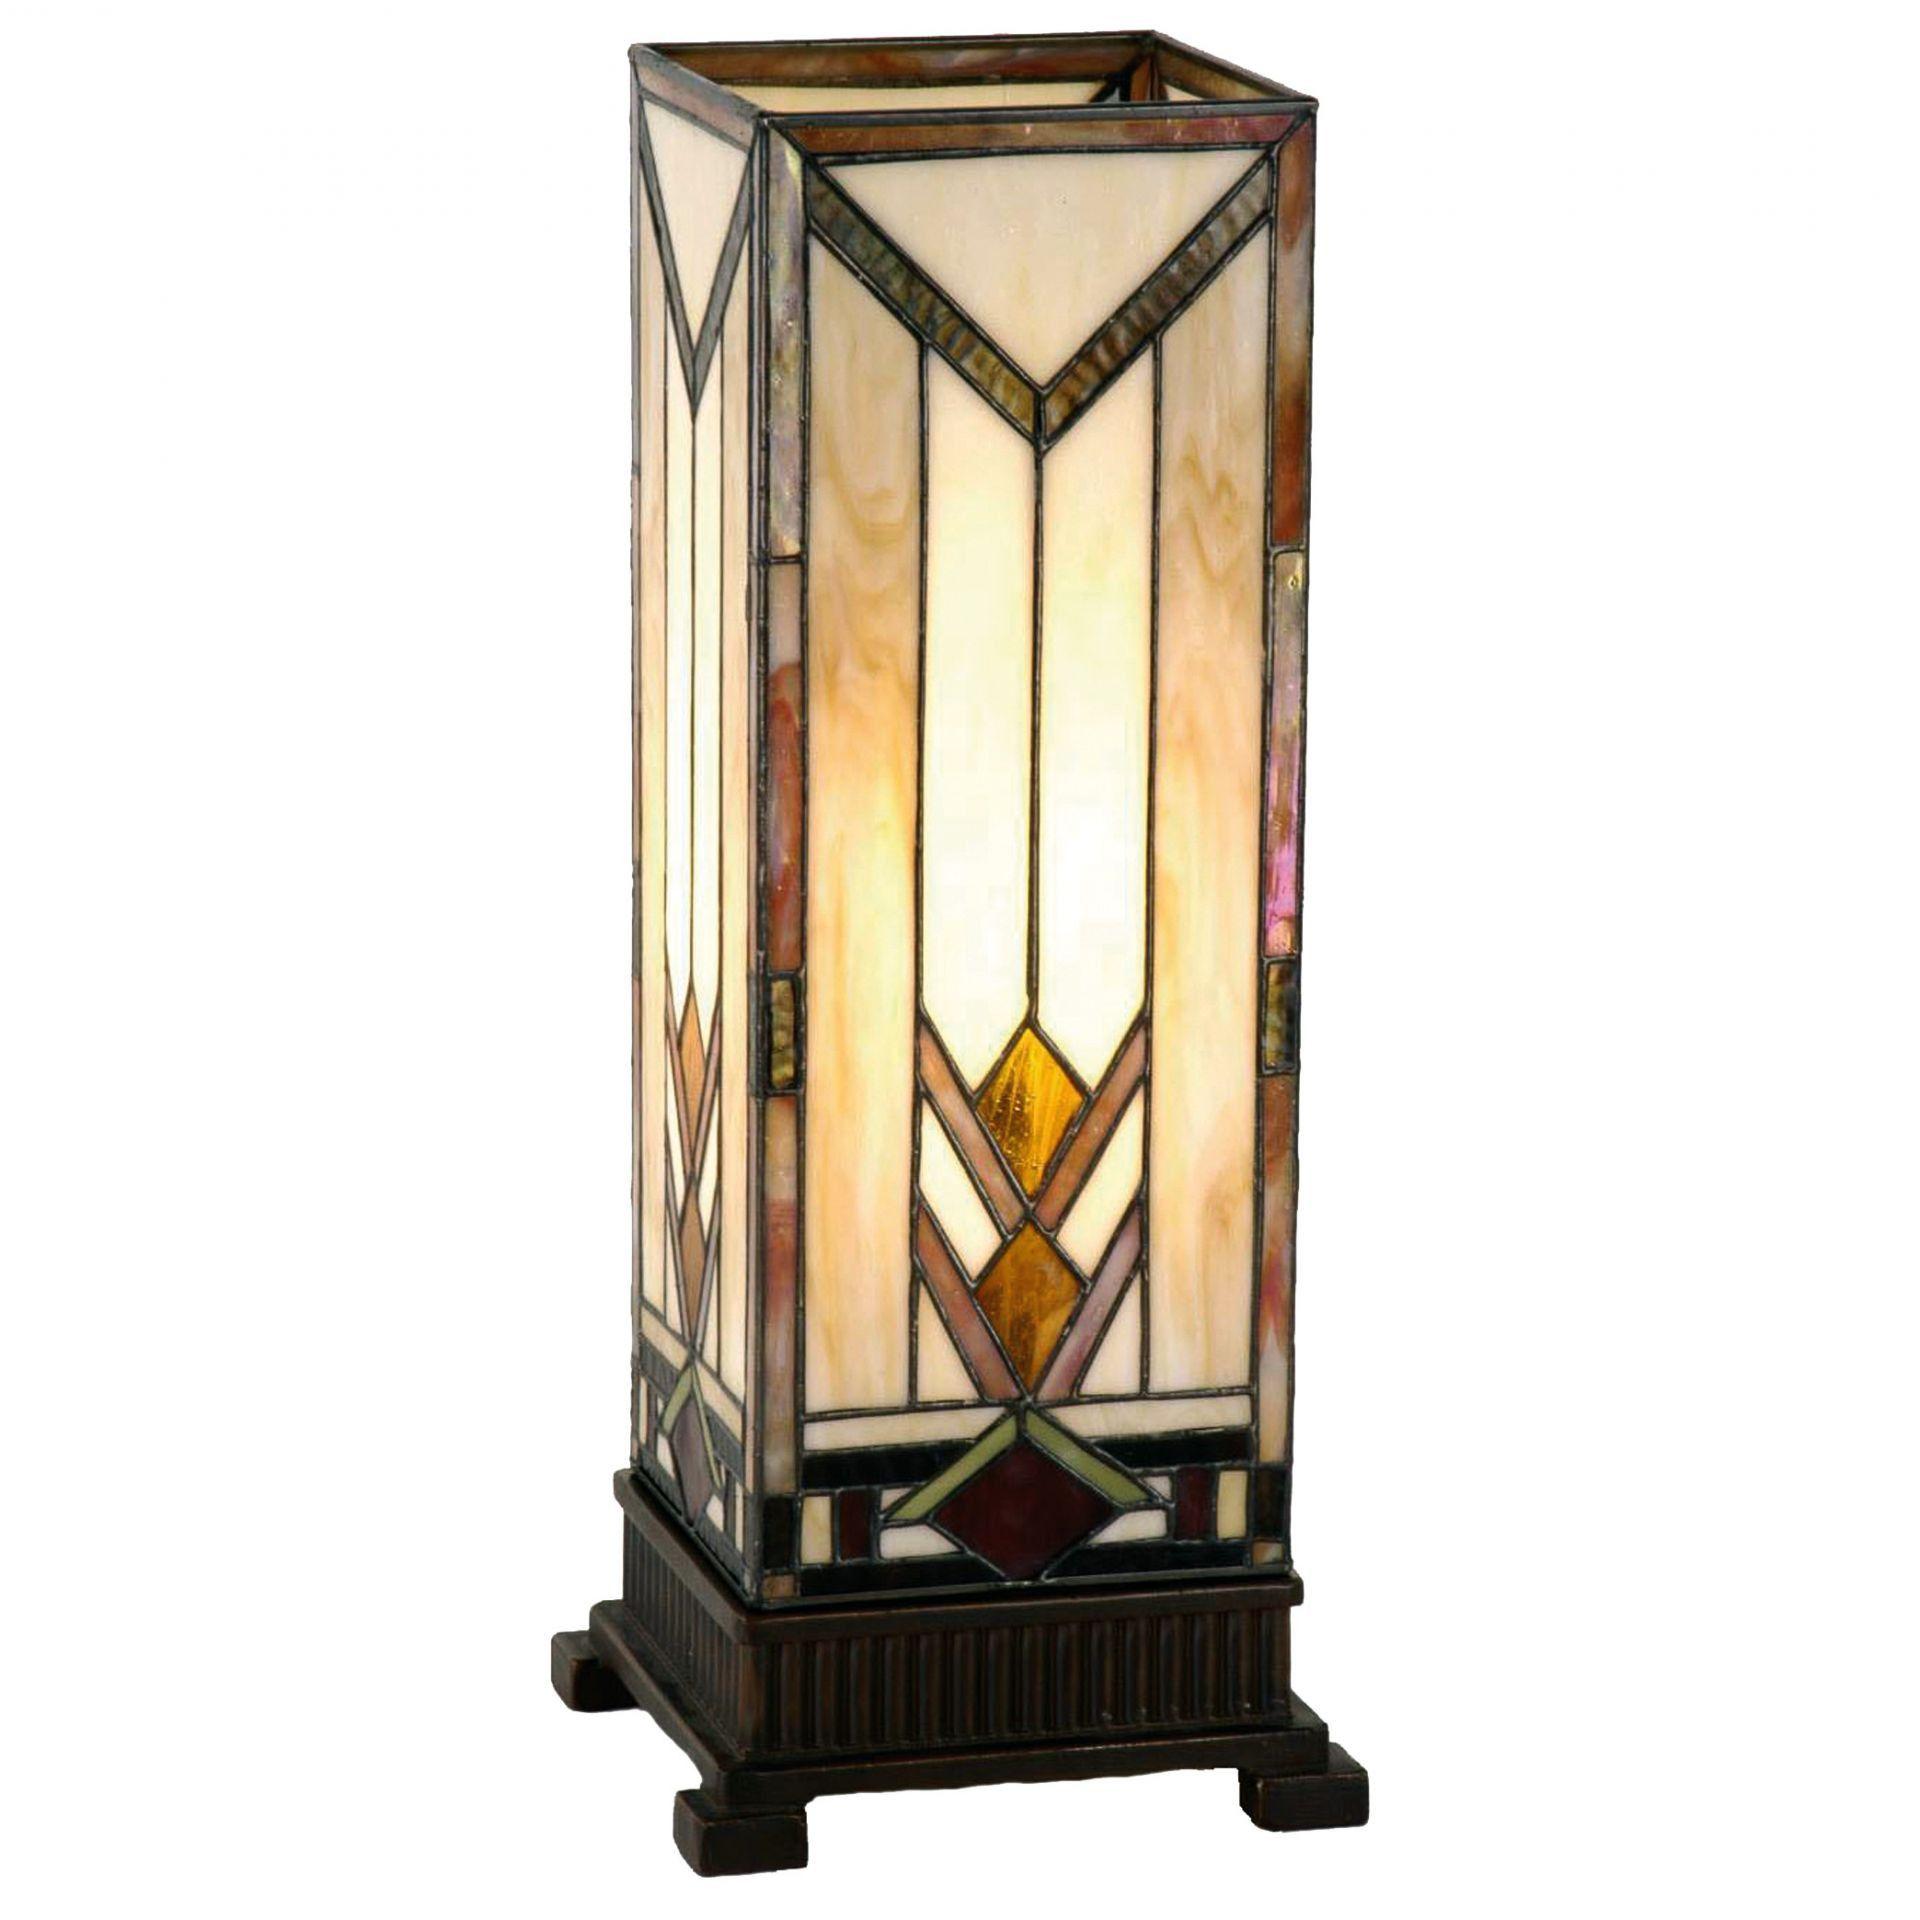 Prairie Tiffany Large Square Table Lamp Stained Glass Candle Holders Glass Lamp Square Table Lamp